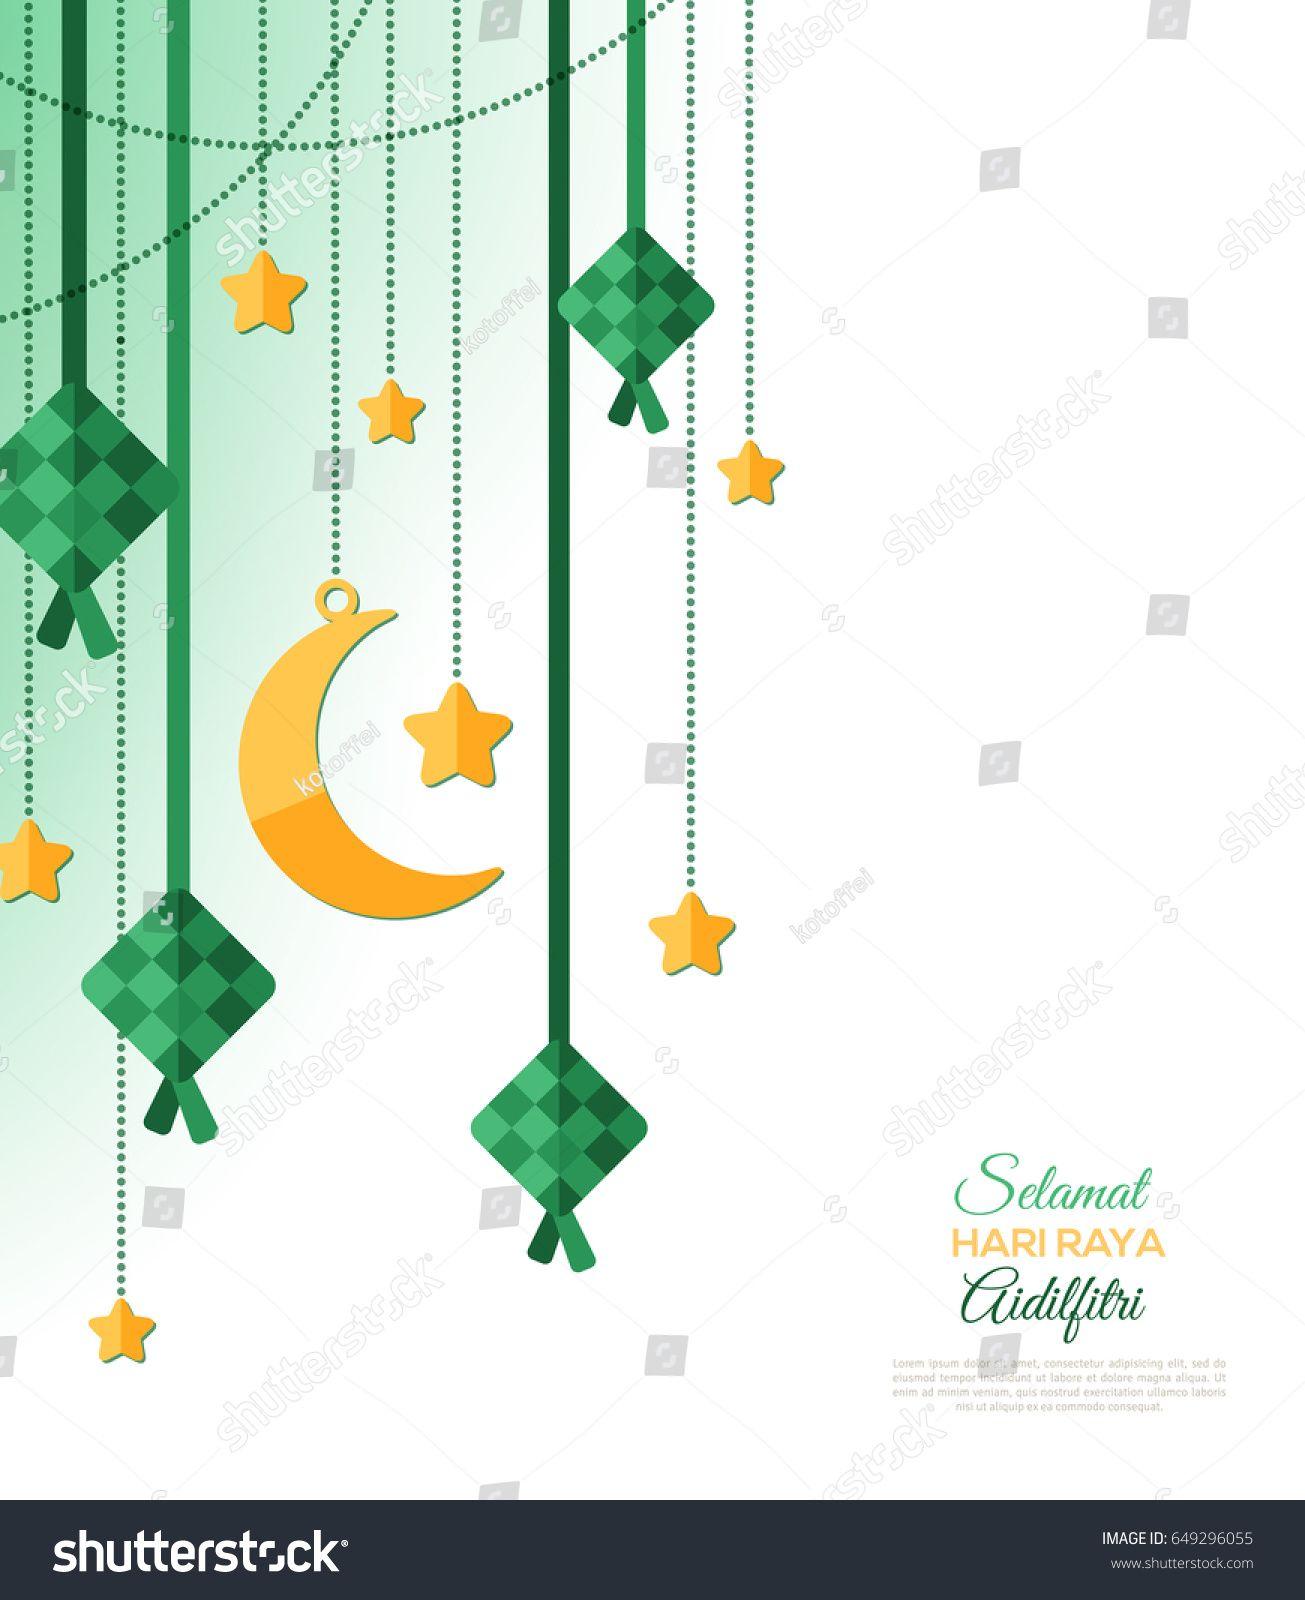 Selamat Hari Raya Aidilfitri Greeting Card Vector Illustration Hanging Ketupat And Crescent Eid Card Designs Envelope Design Inspiration Greeting Card Design